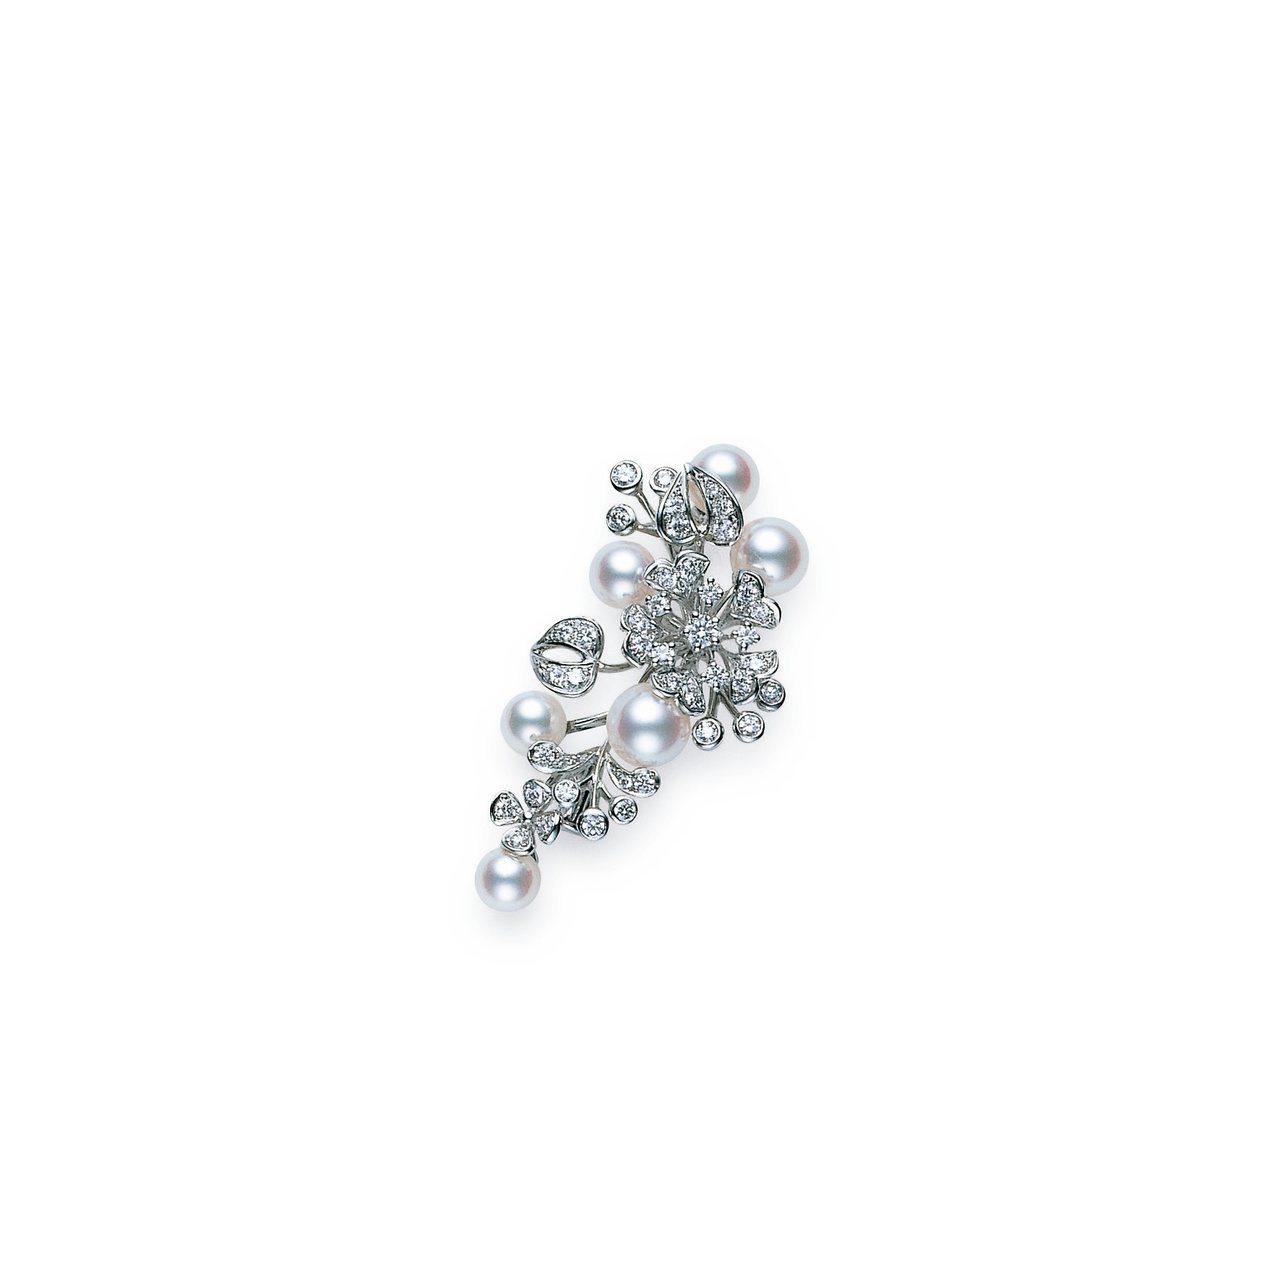 BLOOM Collection日本Akoya珍珠18K白金鑽石胸針,晶華酒店形...